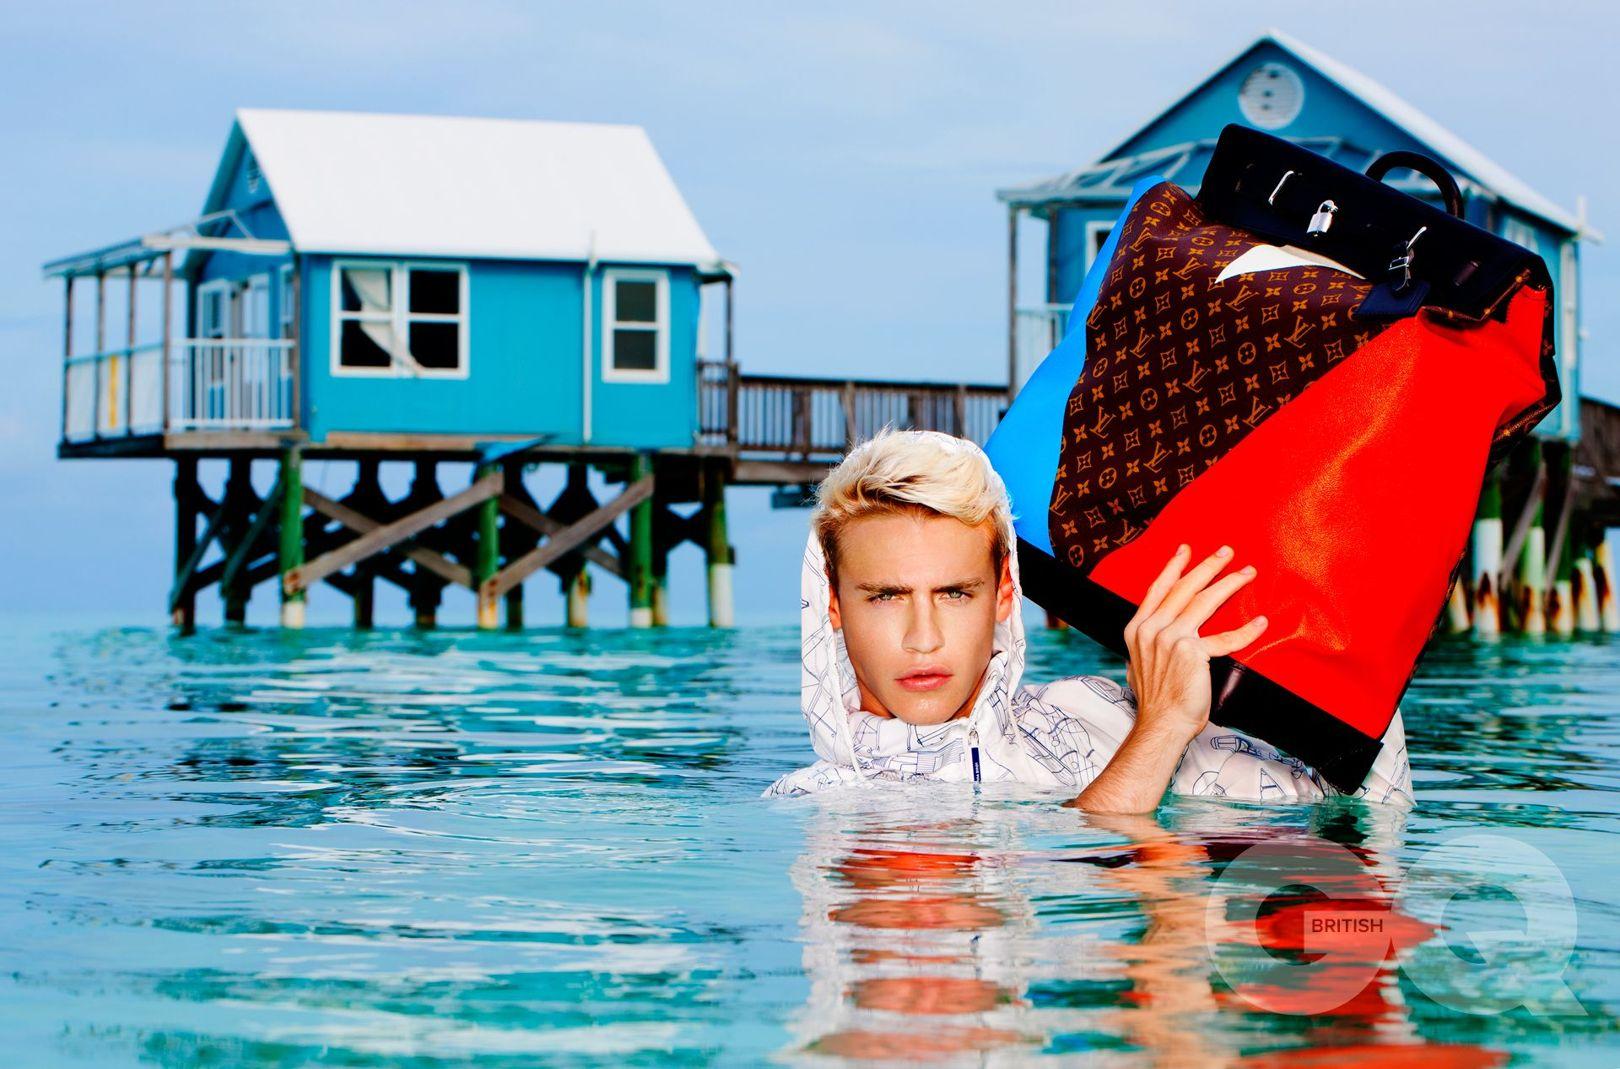 Louis Vuitton Bermuda Shoot (1)